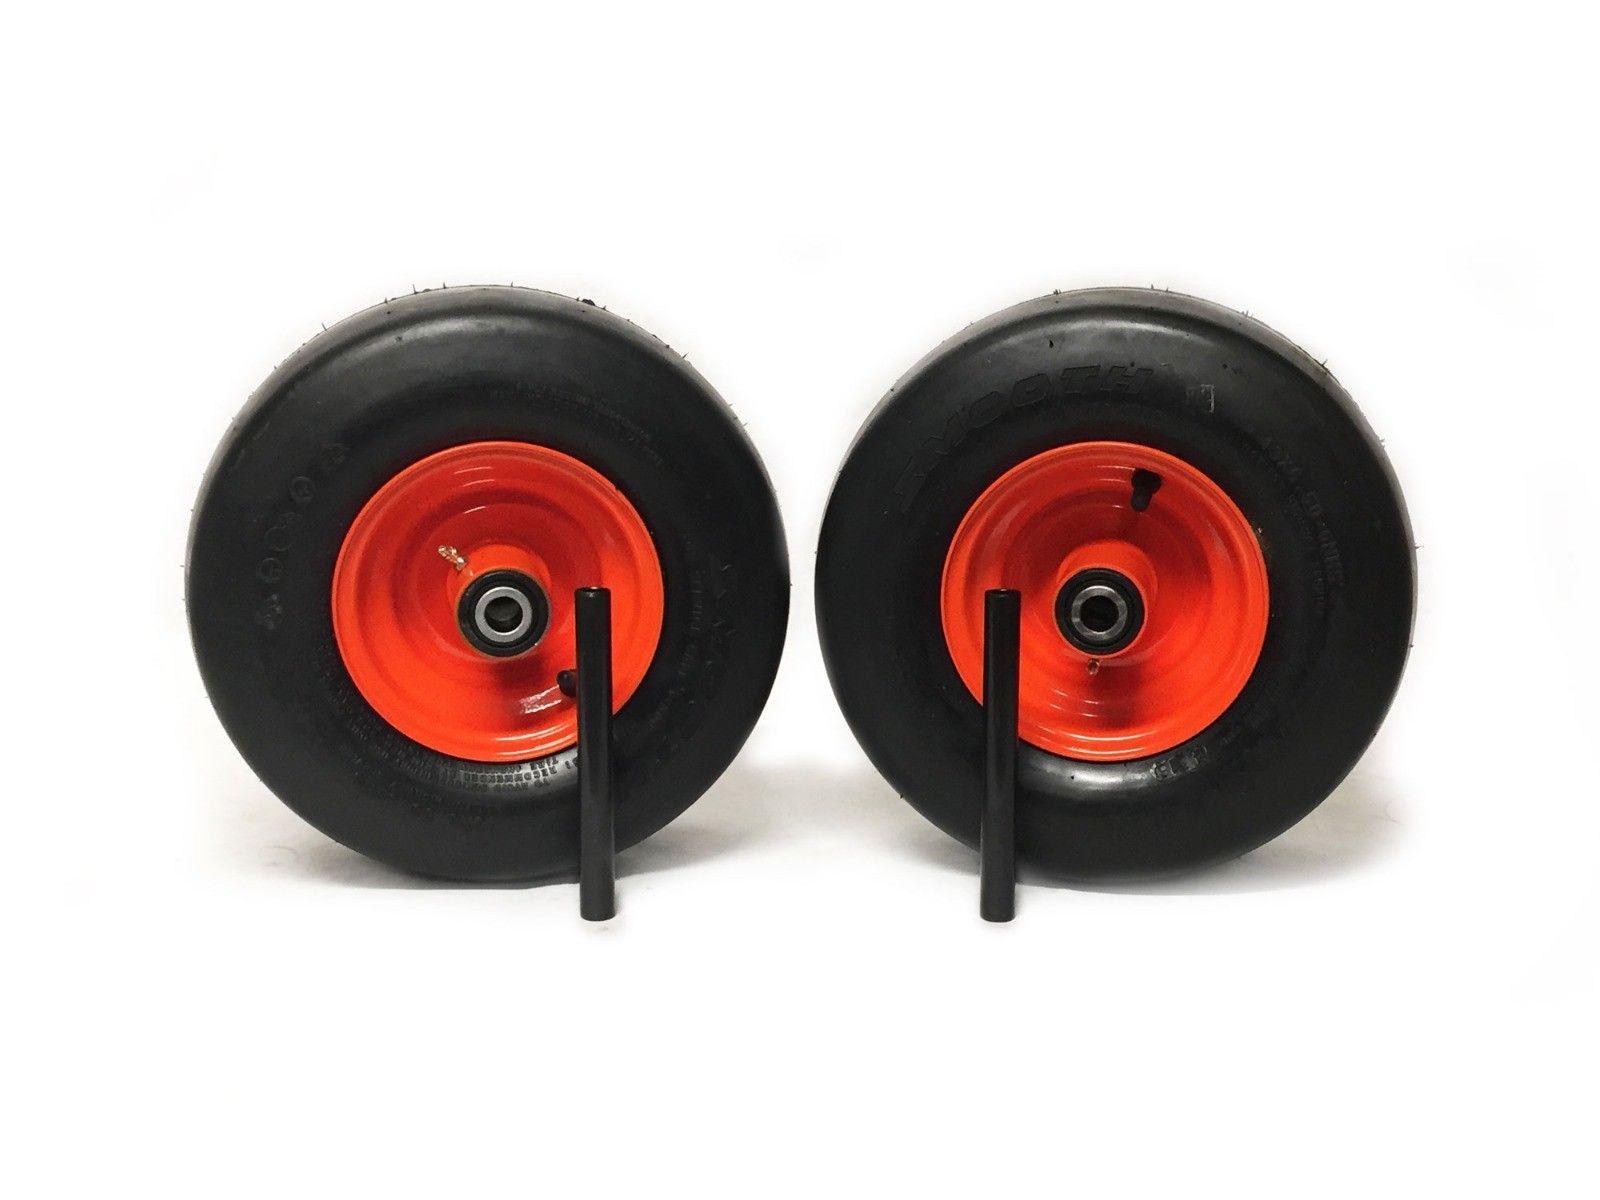 Z725 Z724X Kubota Flat Free Wheel Assemblies 13x6.50-6 Orange Fits Z723 Z724